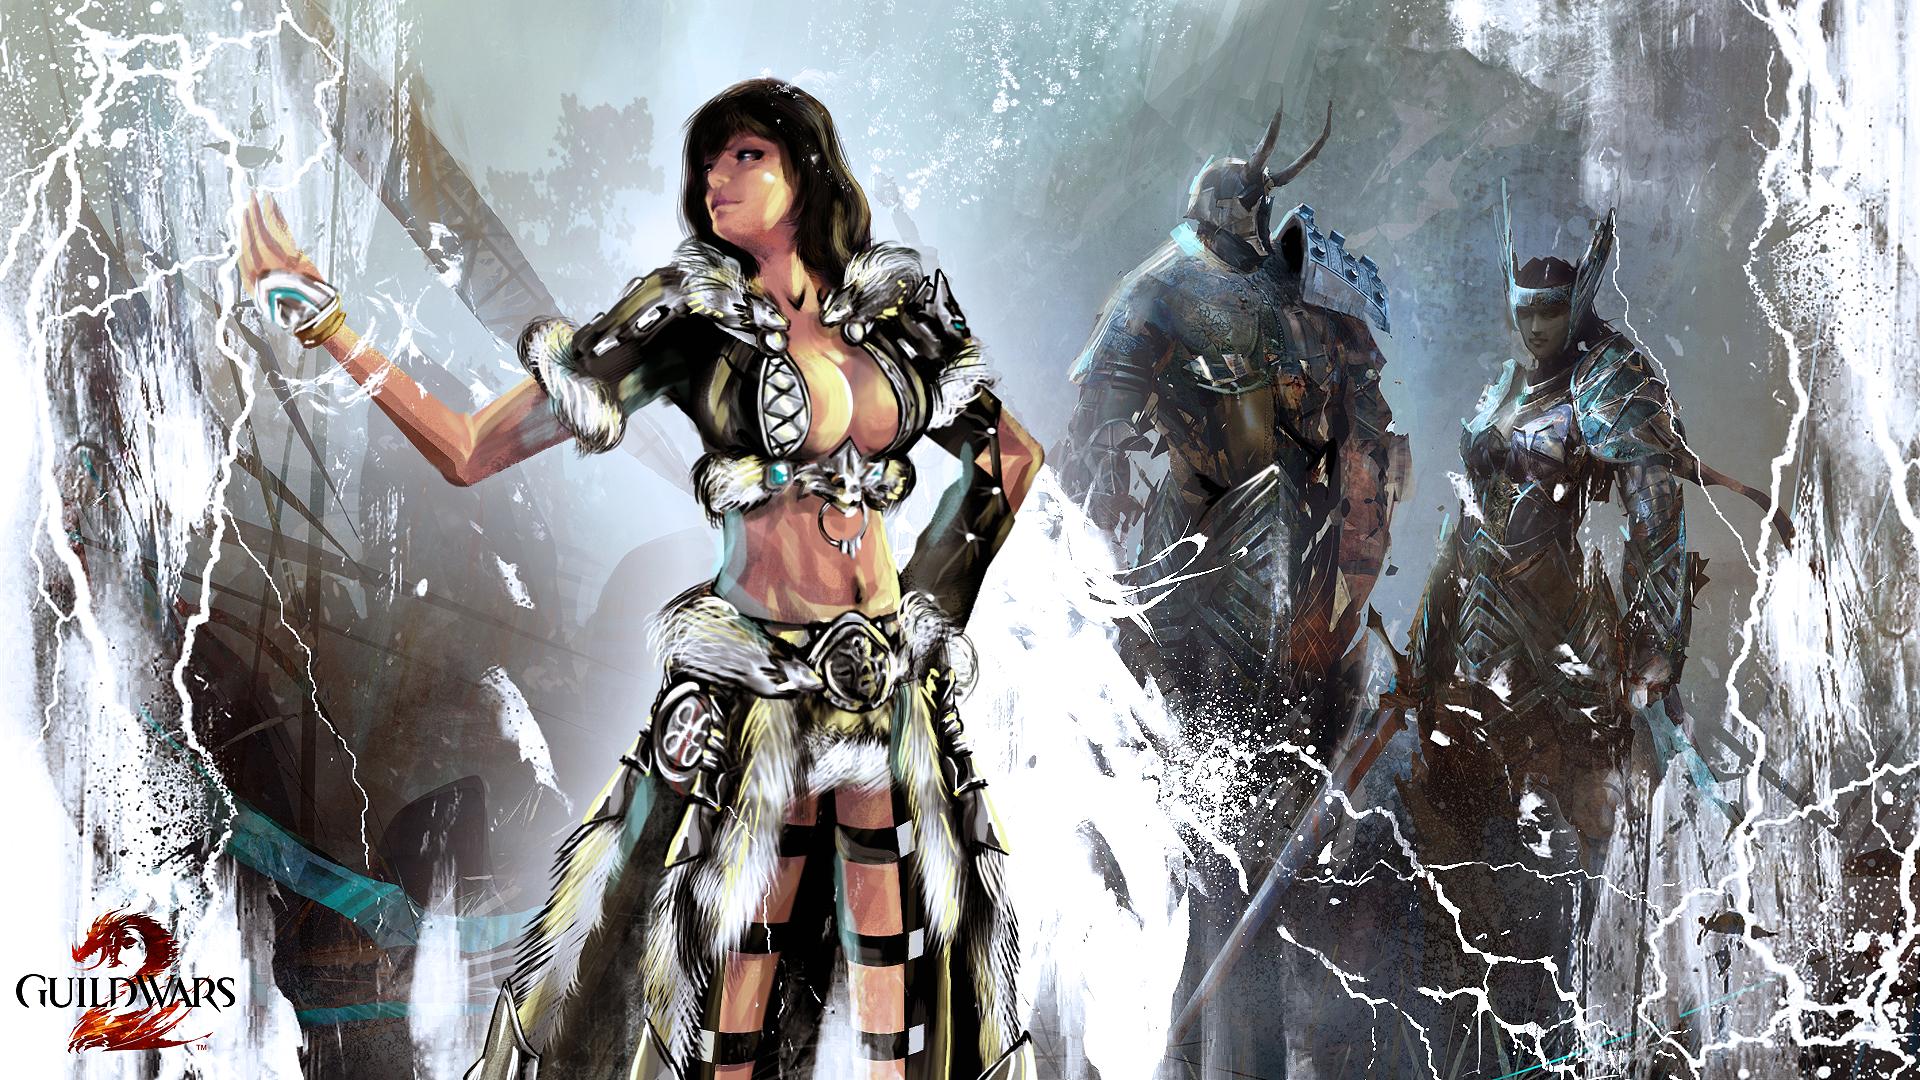 Norn Elementalist Guild Wars 2 Havroun Armor By Fotis Sora